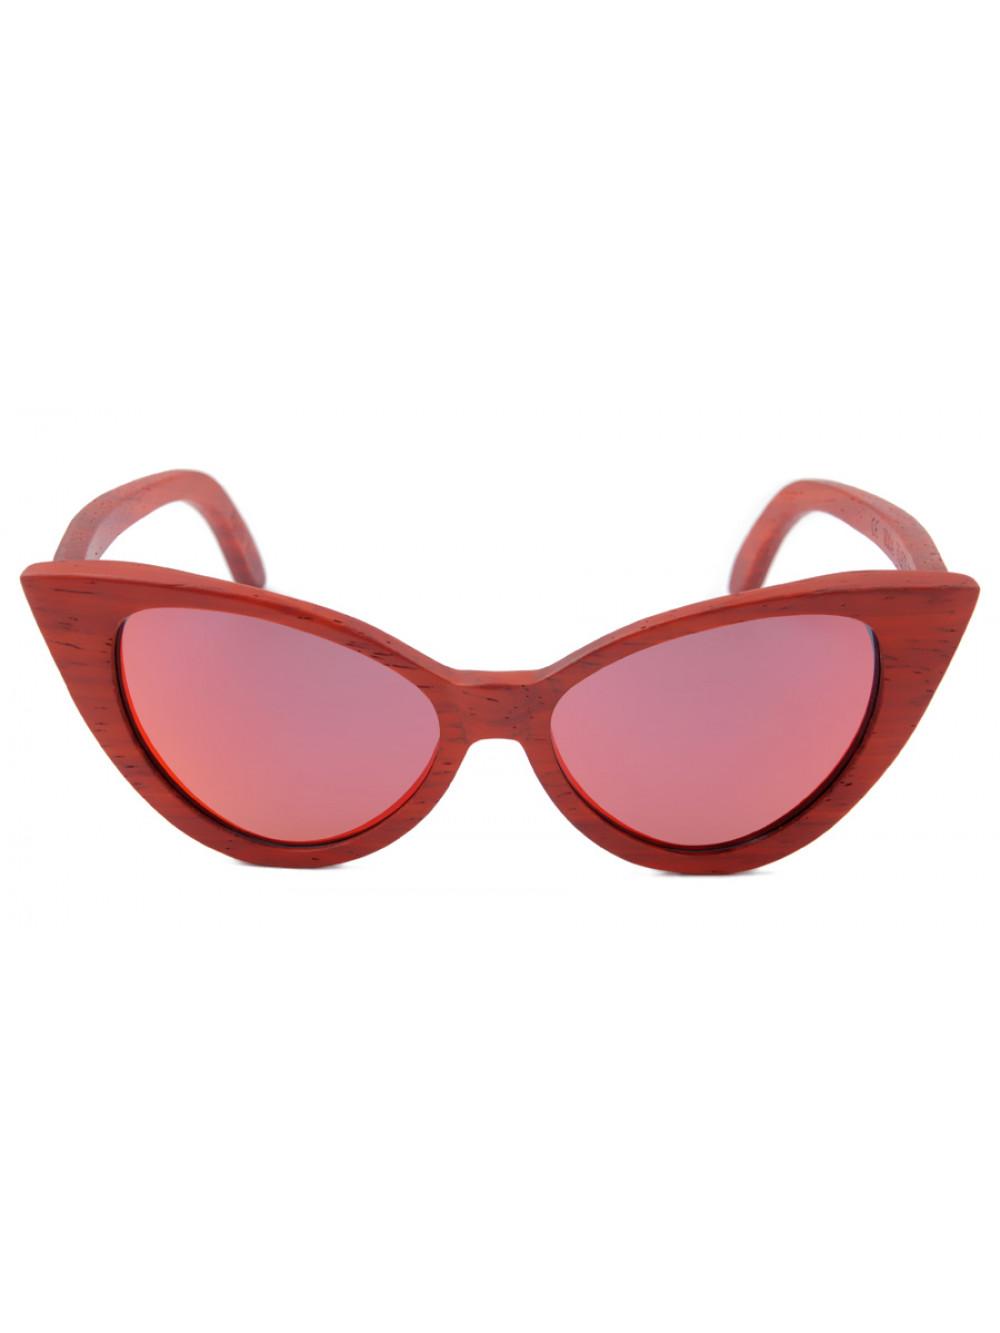 Dámske drevené slnečné okuliare Red Cat Eyes 974a2b594b1